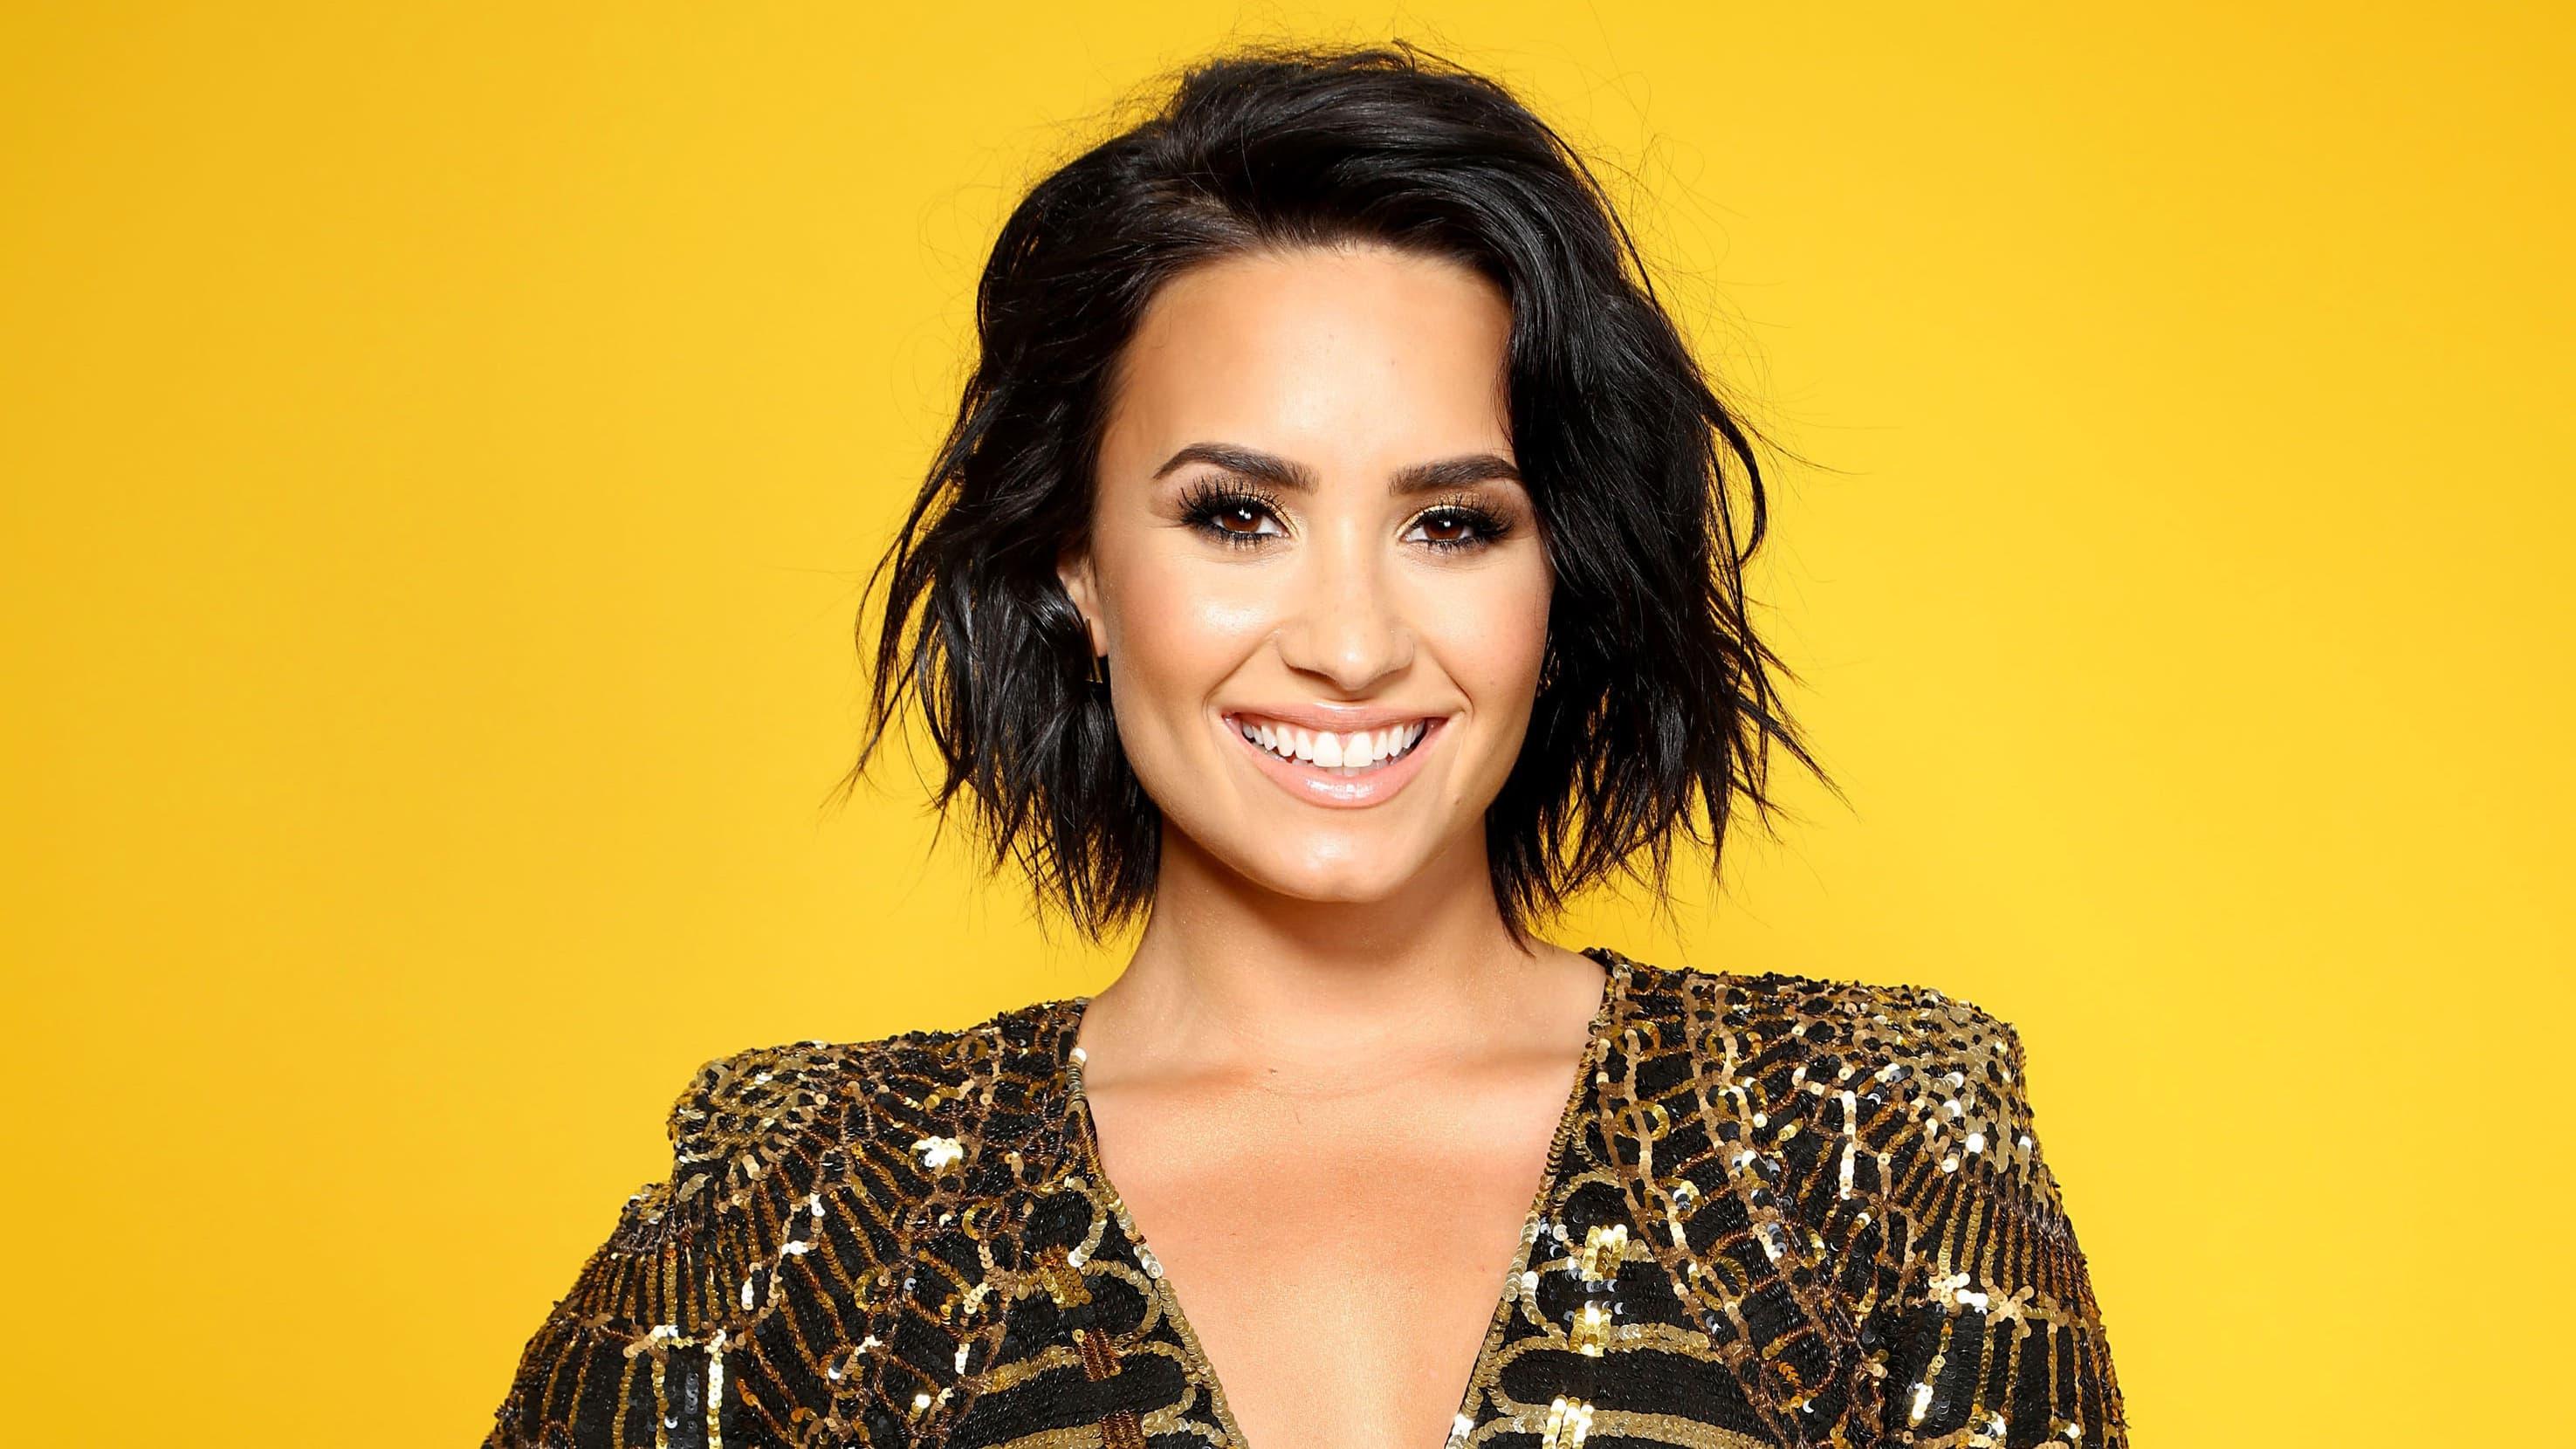 Demi Lovato Wallpapers HD 2951x1660